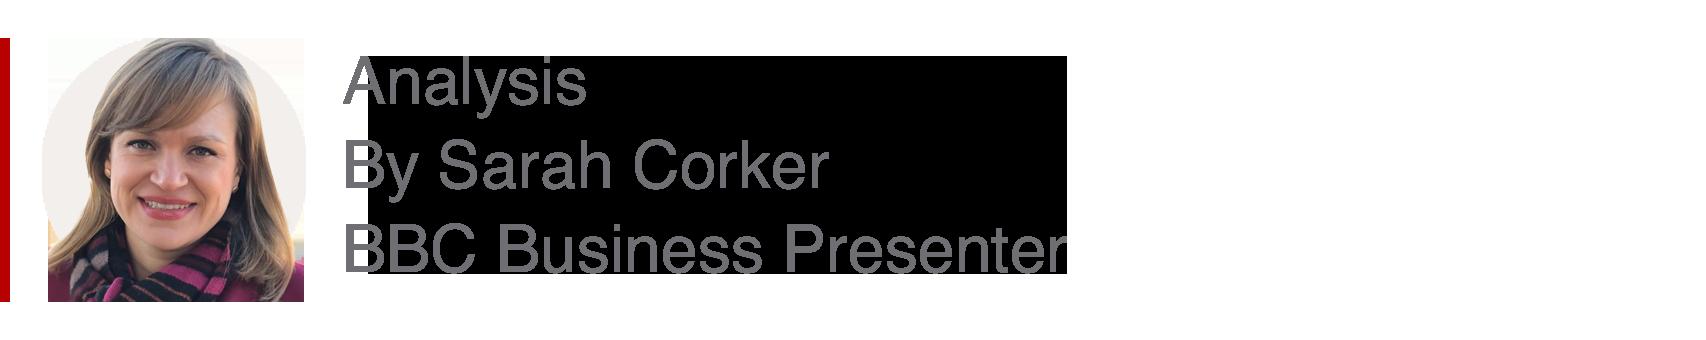 Analysis box by Sarah Corker, Business presenter